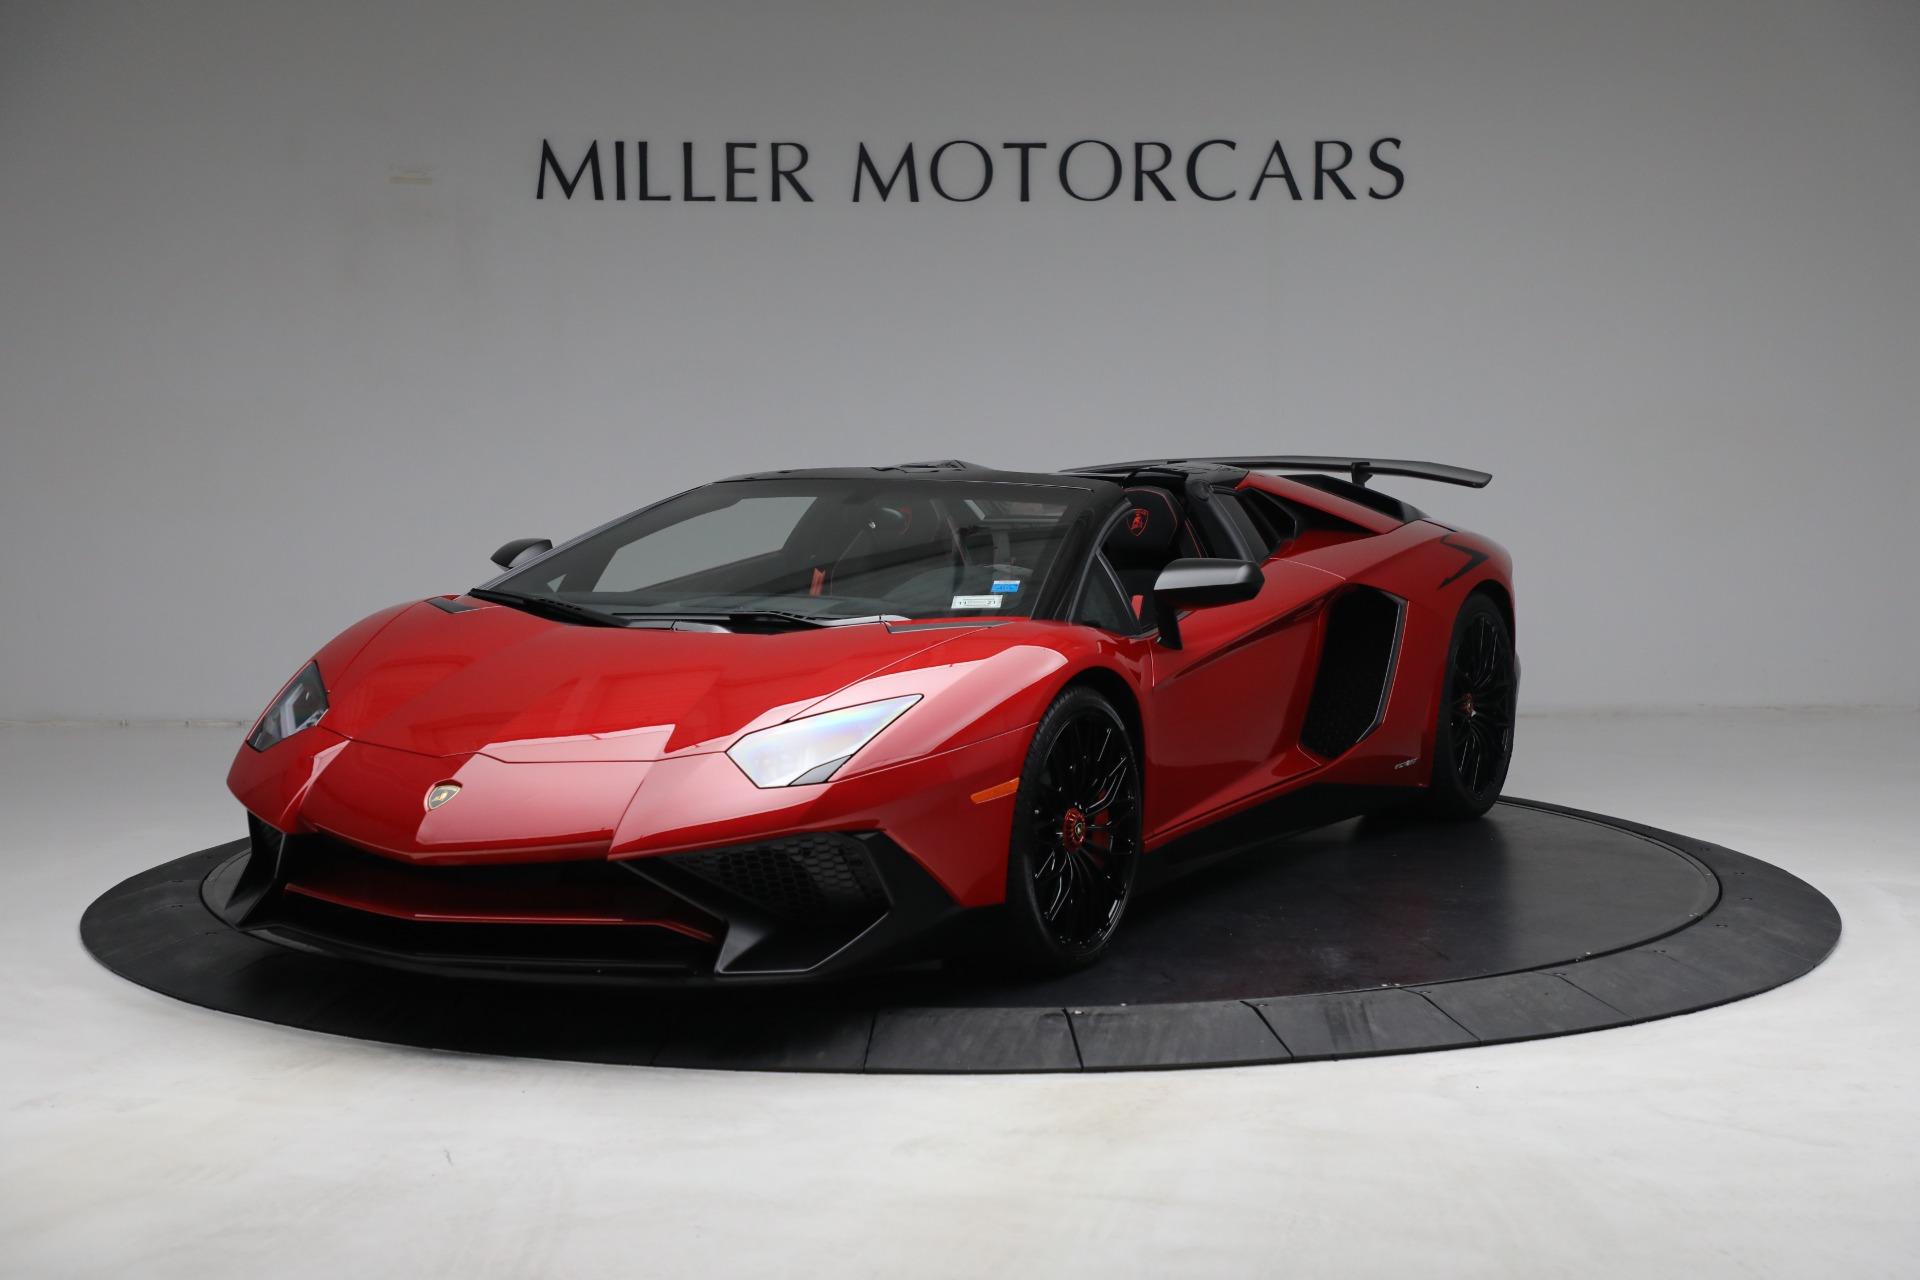 Used 2017 Lamborghini Aventador LP 750-4 SV for sale $589,900 at McLaren Greenwich in Greenwich CT 06830 1